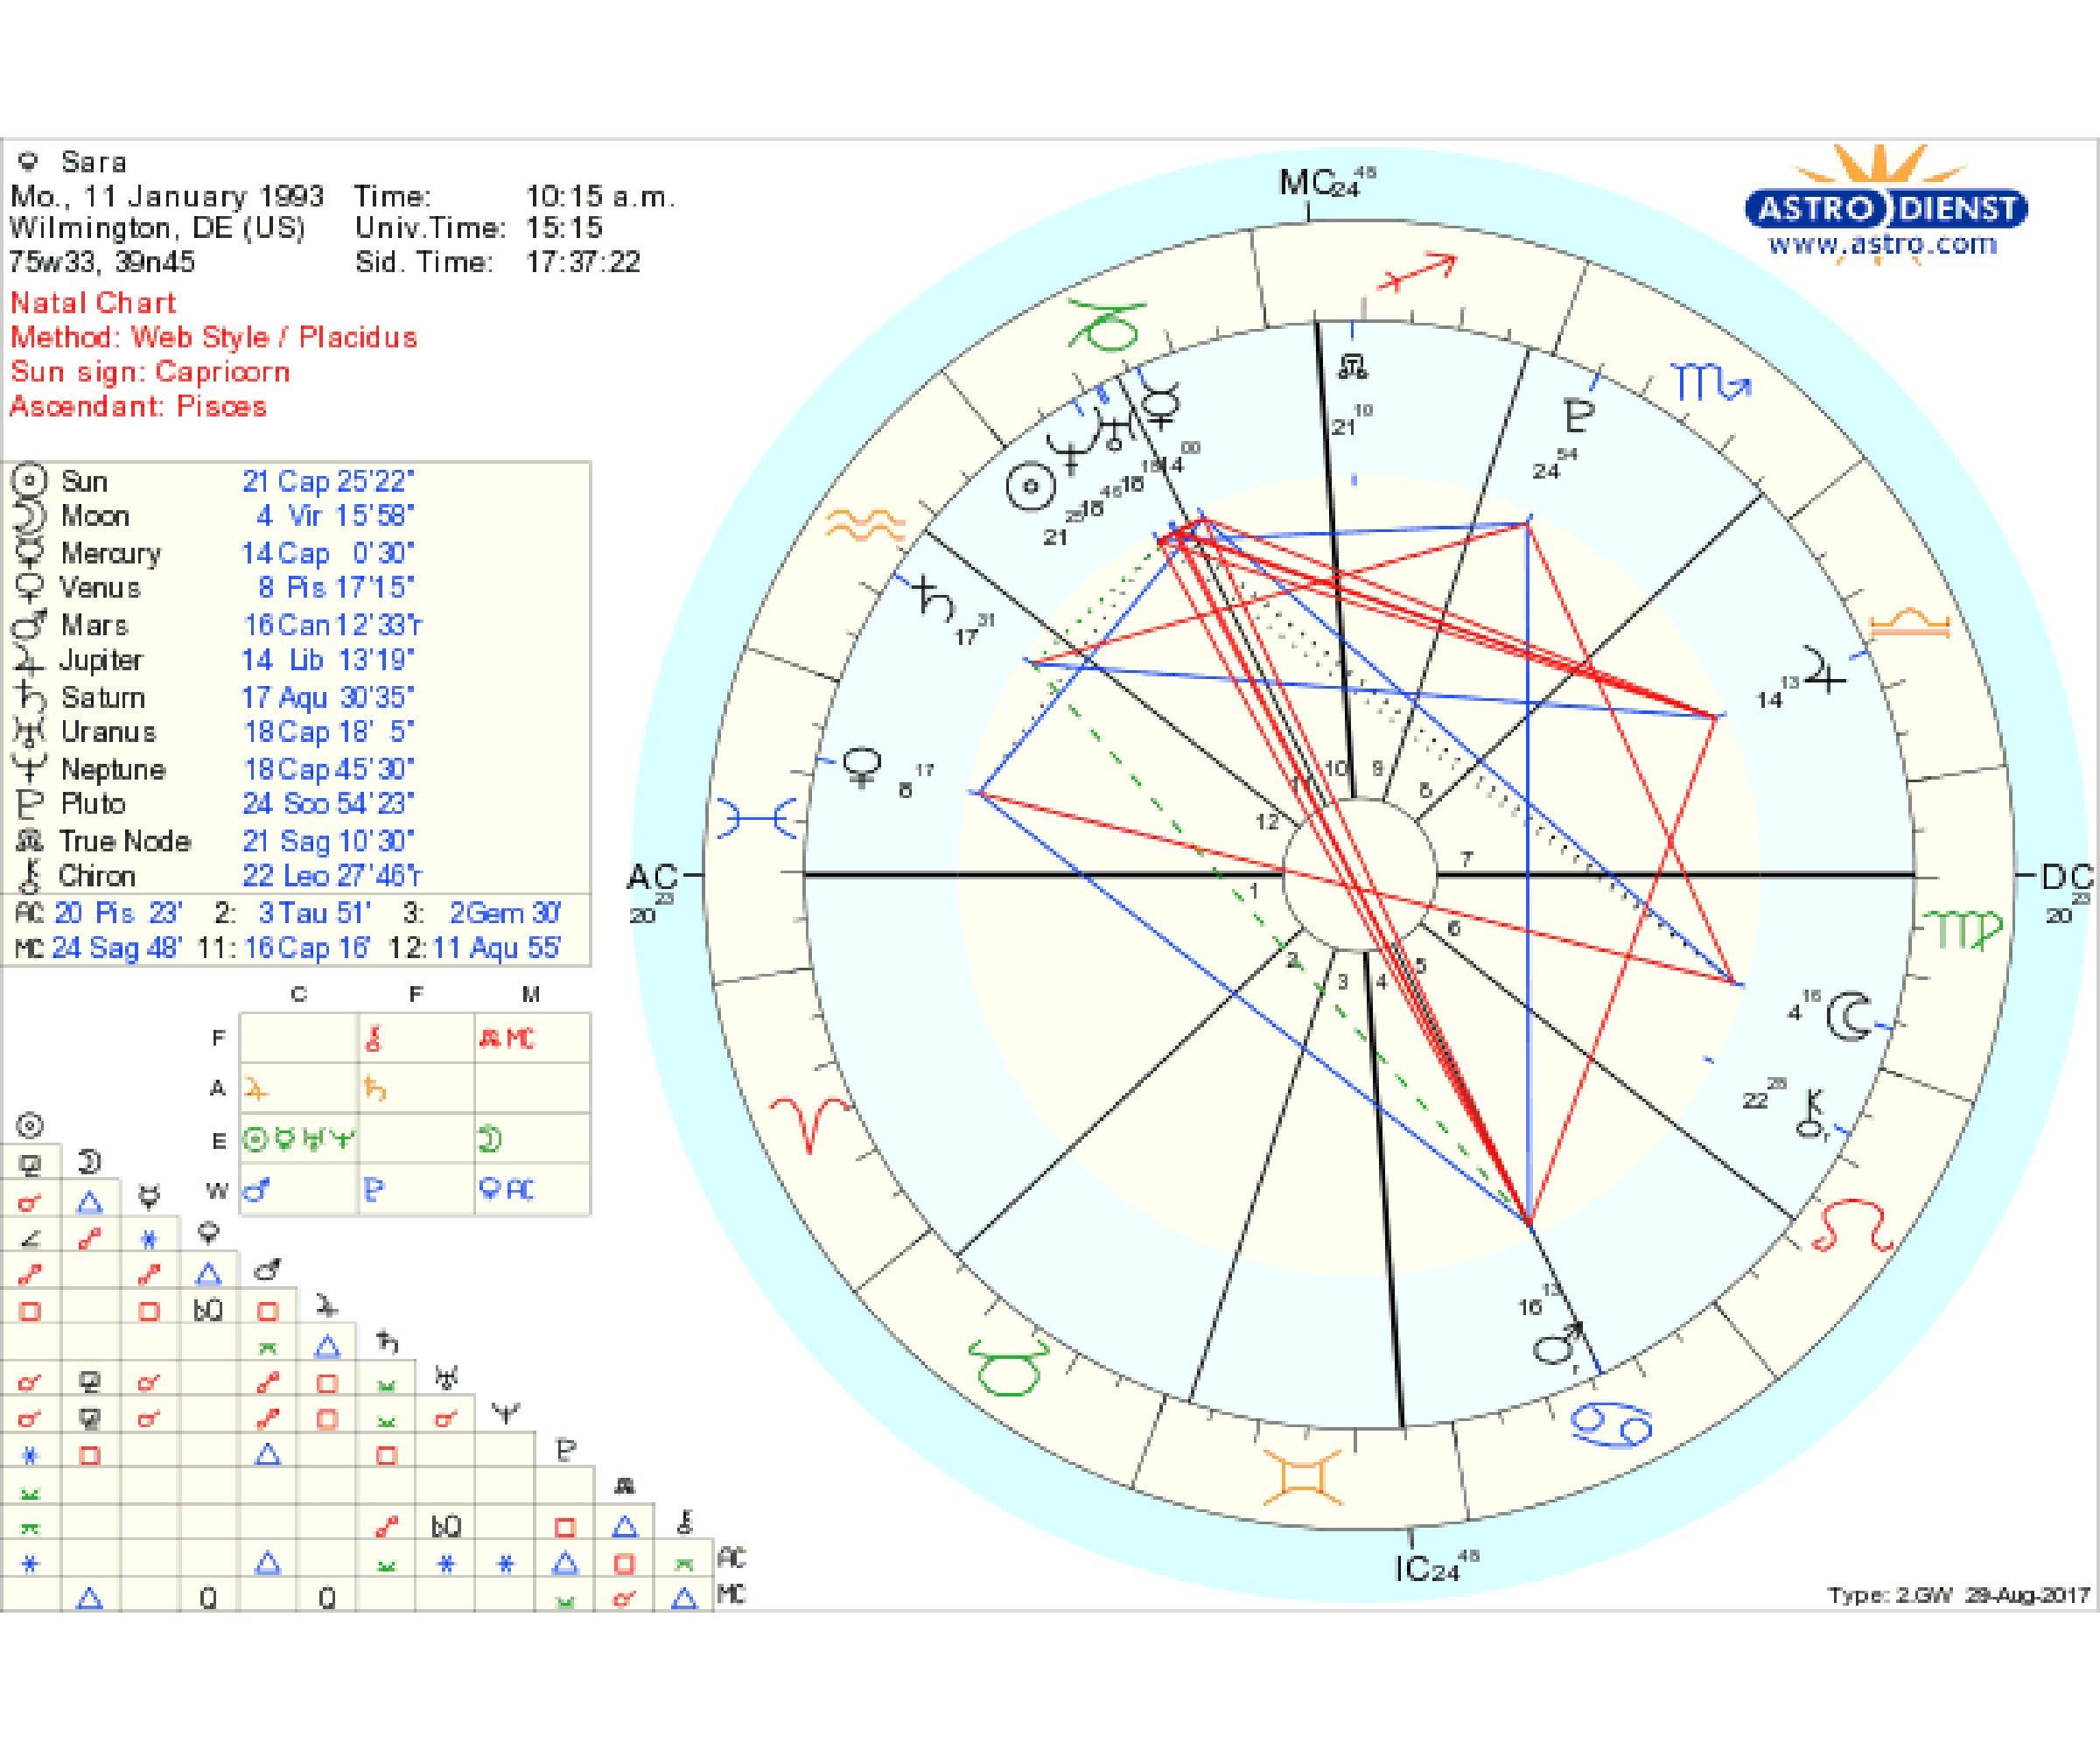 Professional Astrologers Read My Natal Birth Chart